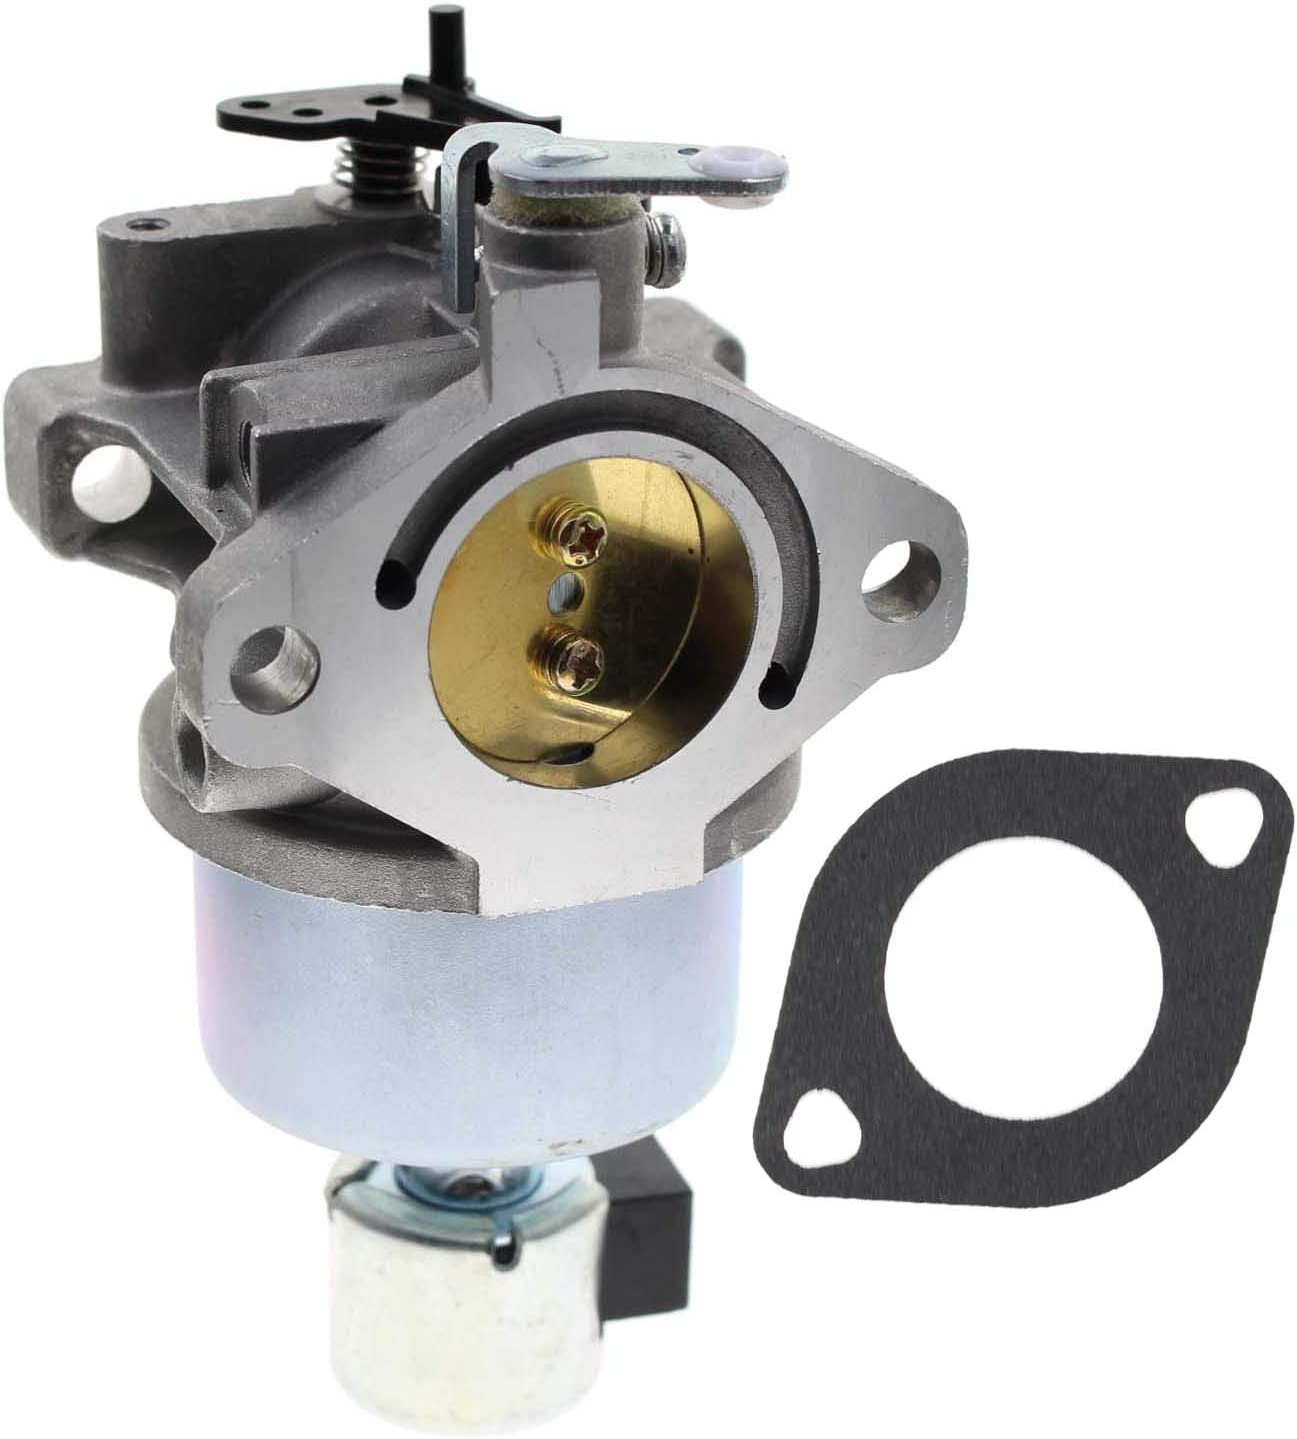 Carbhub 594605 Carburetor for Briggs & Stratton 594605 792768 591734 594603 Single Cylinder Engine Replacement Carburetor - 594605 Carburetor